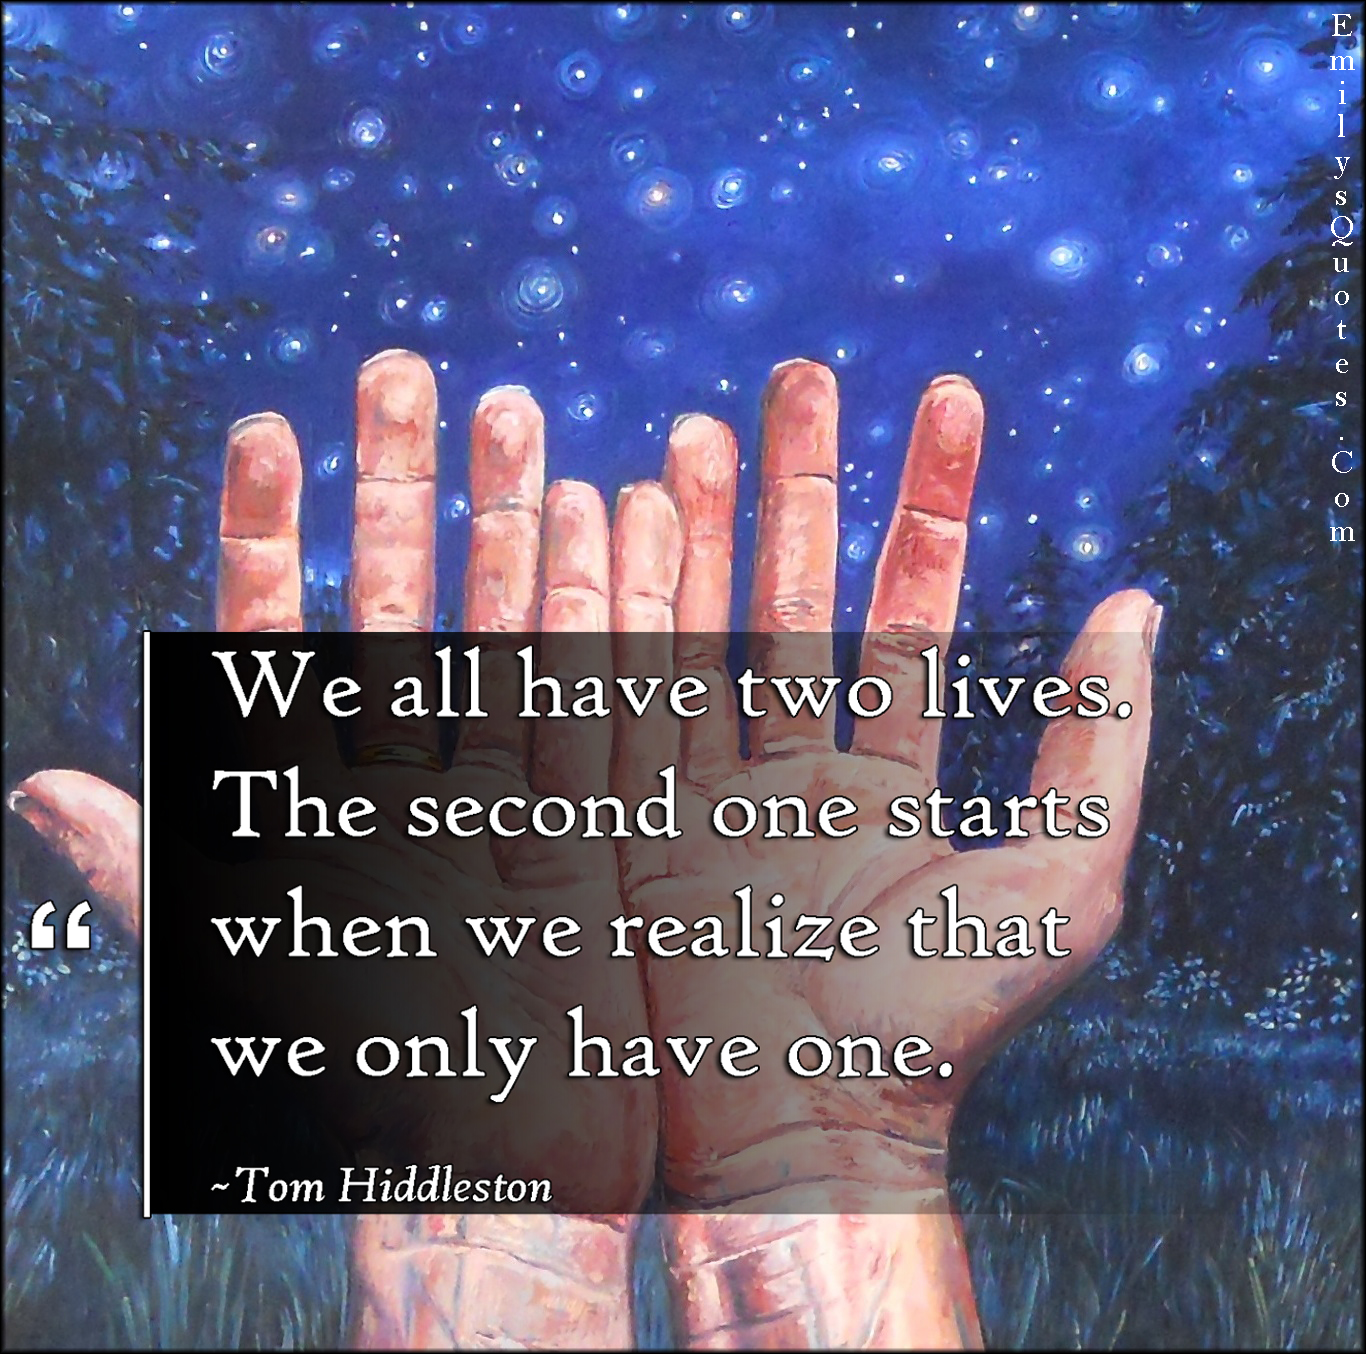 EmilysQuotes.Com - two, life, realize, understanding, inspirational, intelligent, Tom Hiddleston